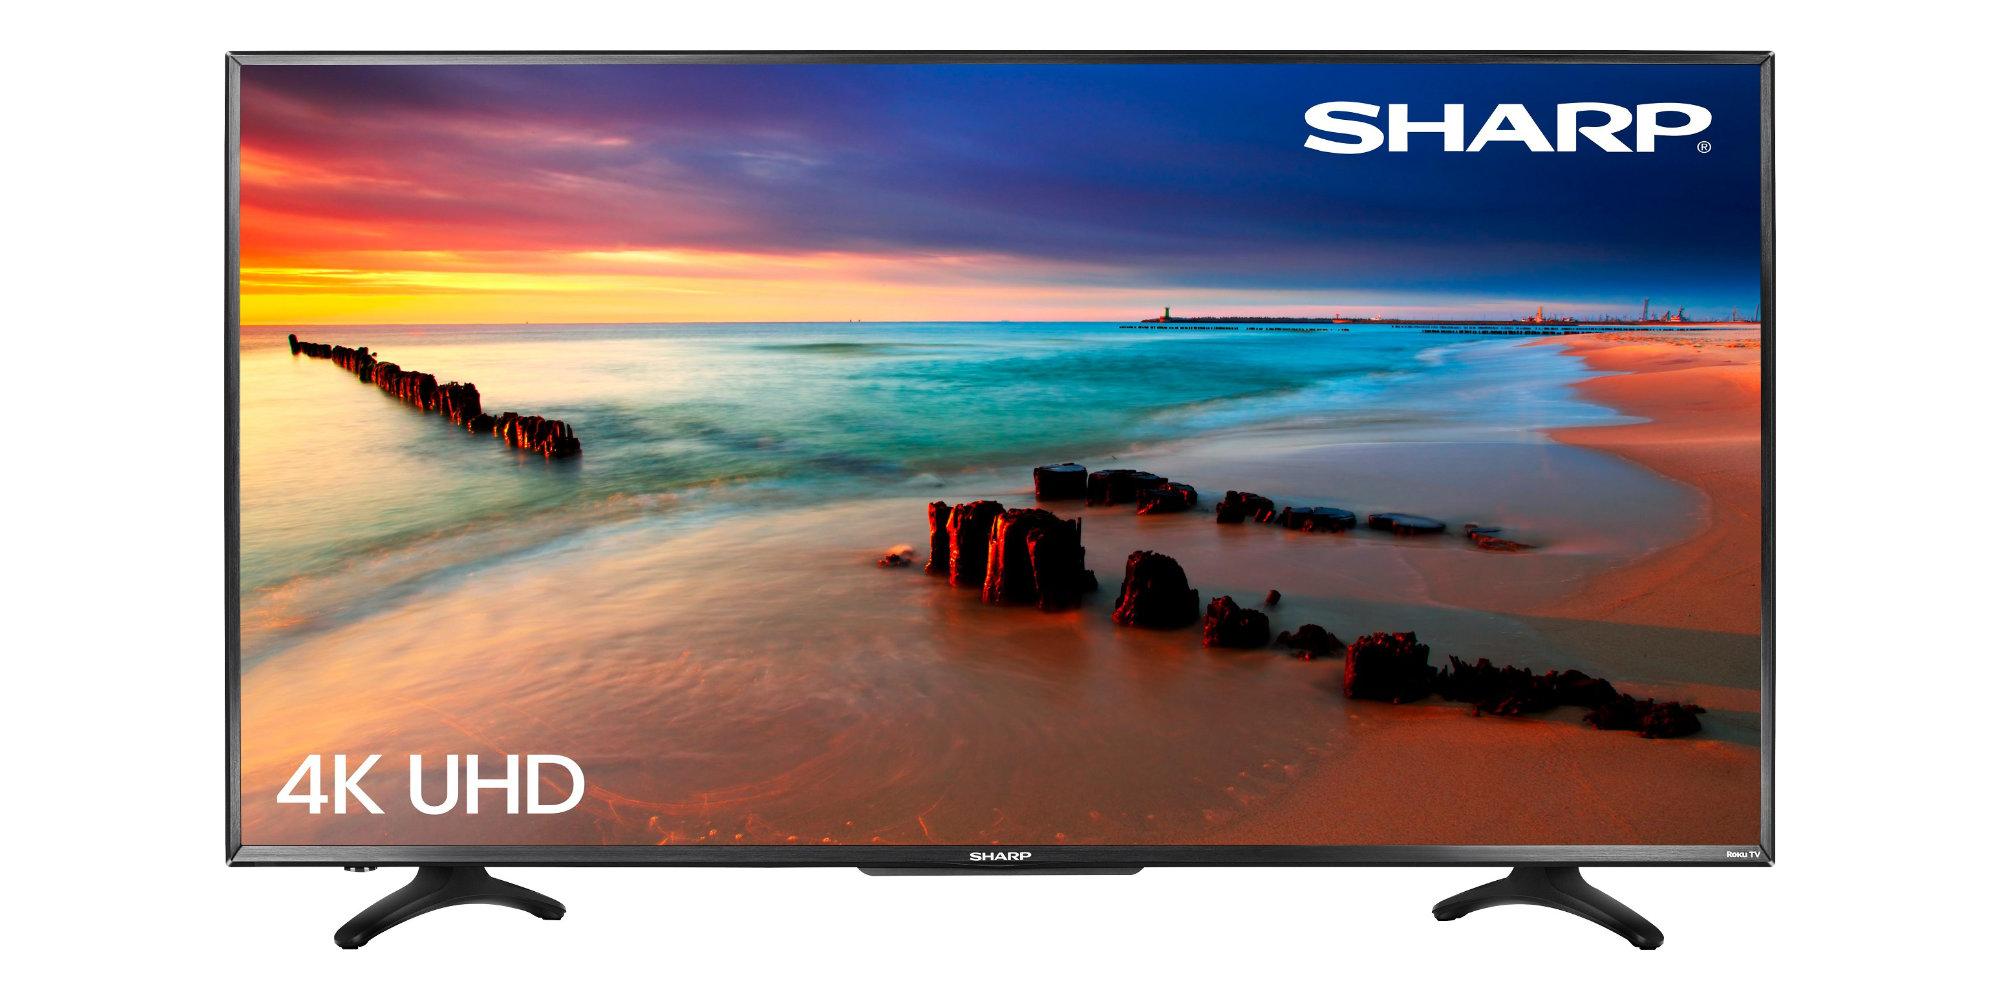 4K, HDR, and Roku software make Sharp's 55-inch Smart TV a solid upgrade: $300 (Reg. $400)